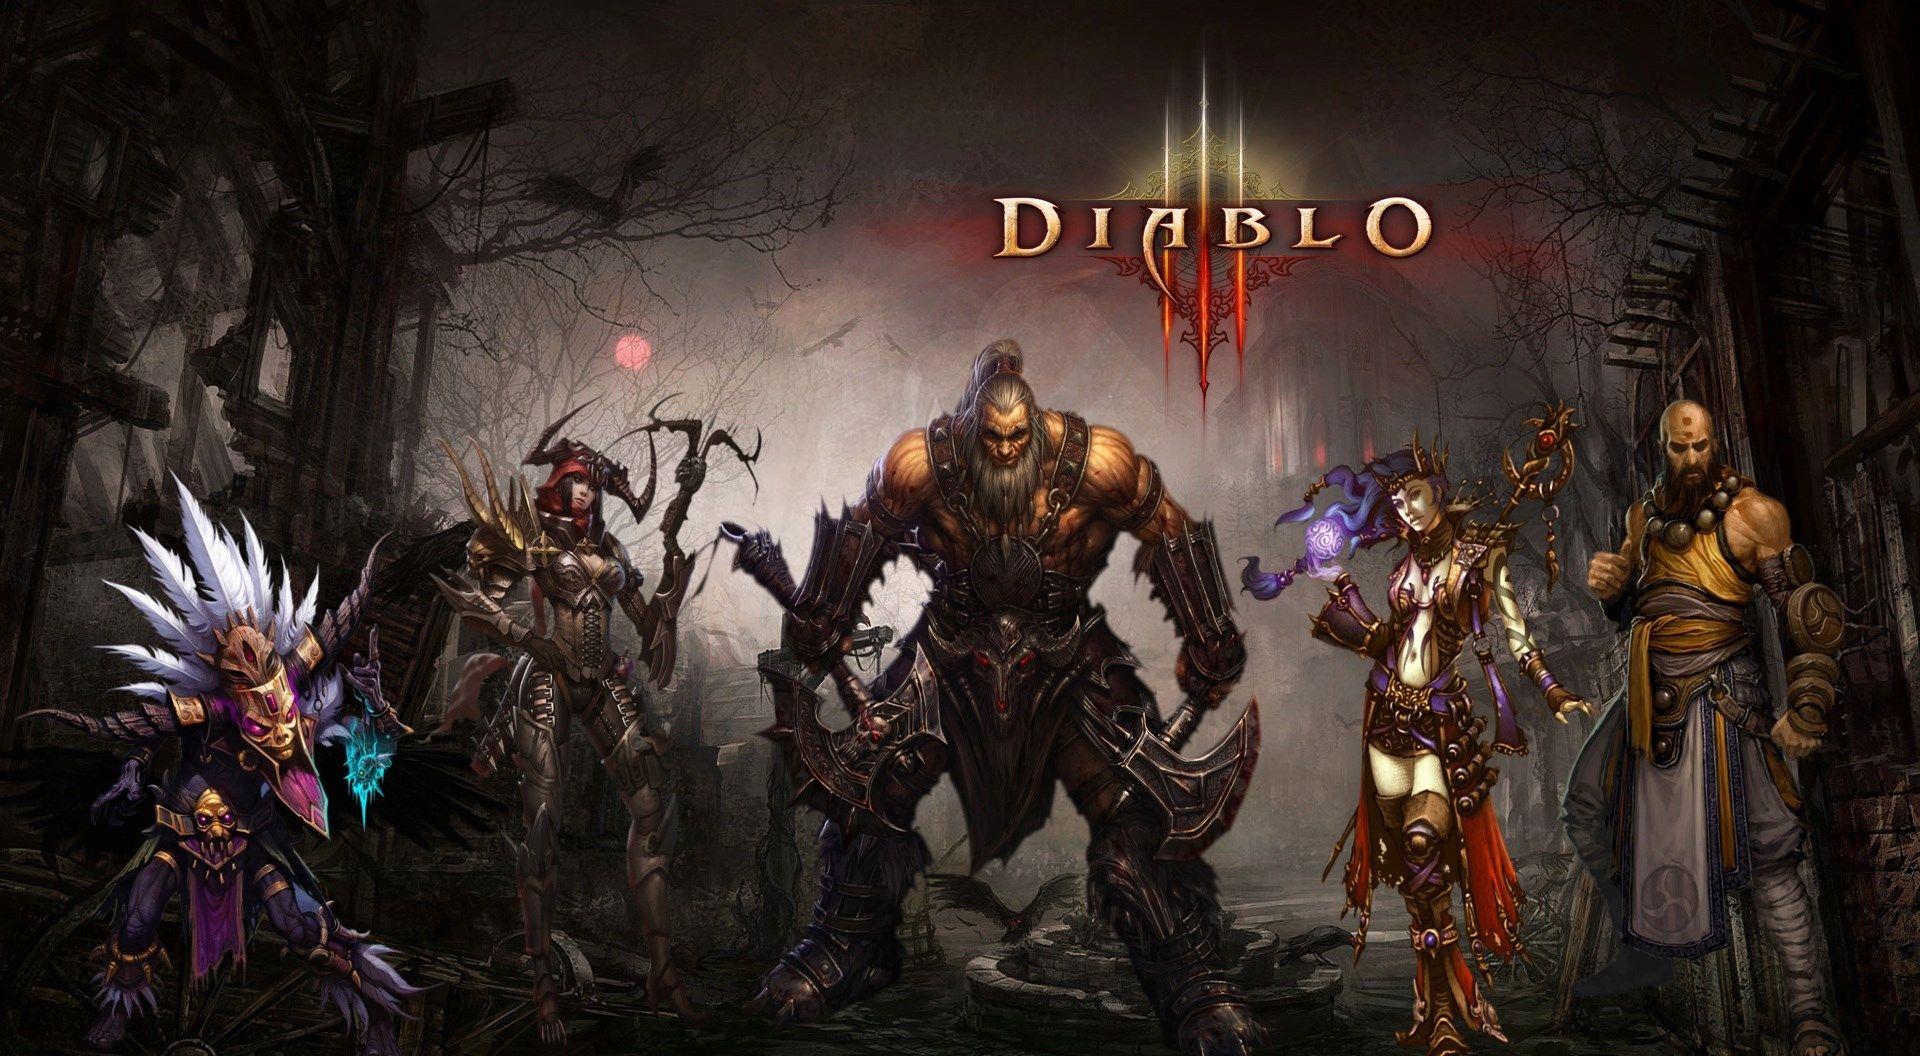 Screen Diablo 3 Pictures 1920x1080 Diablo 3 Wallpaper Diablo